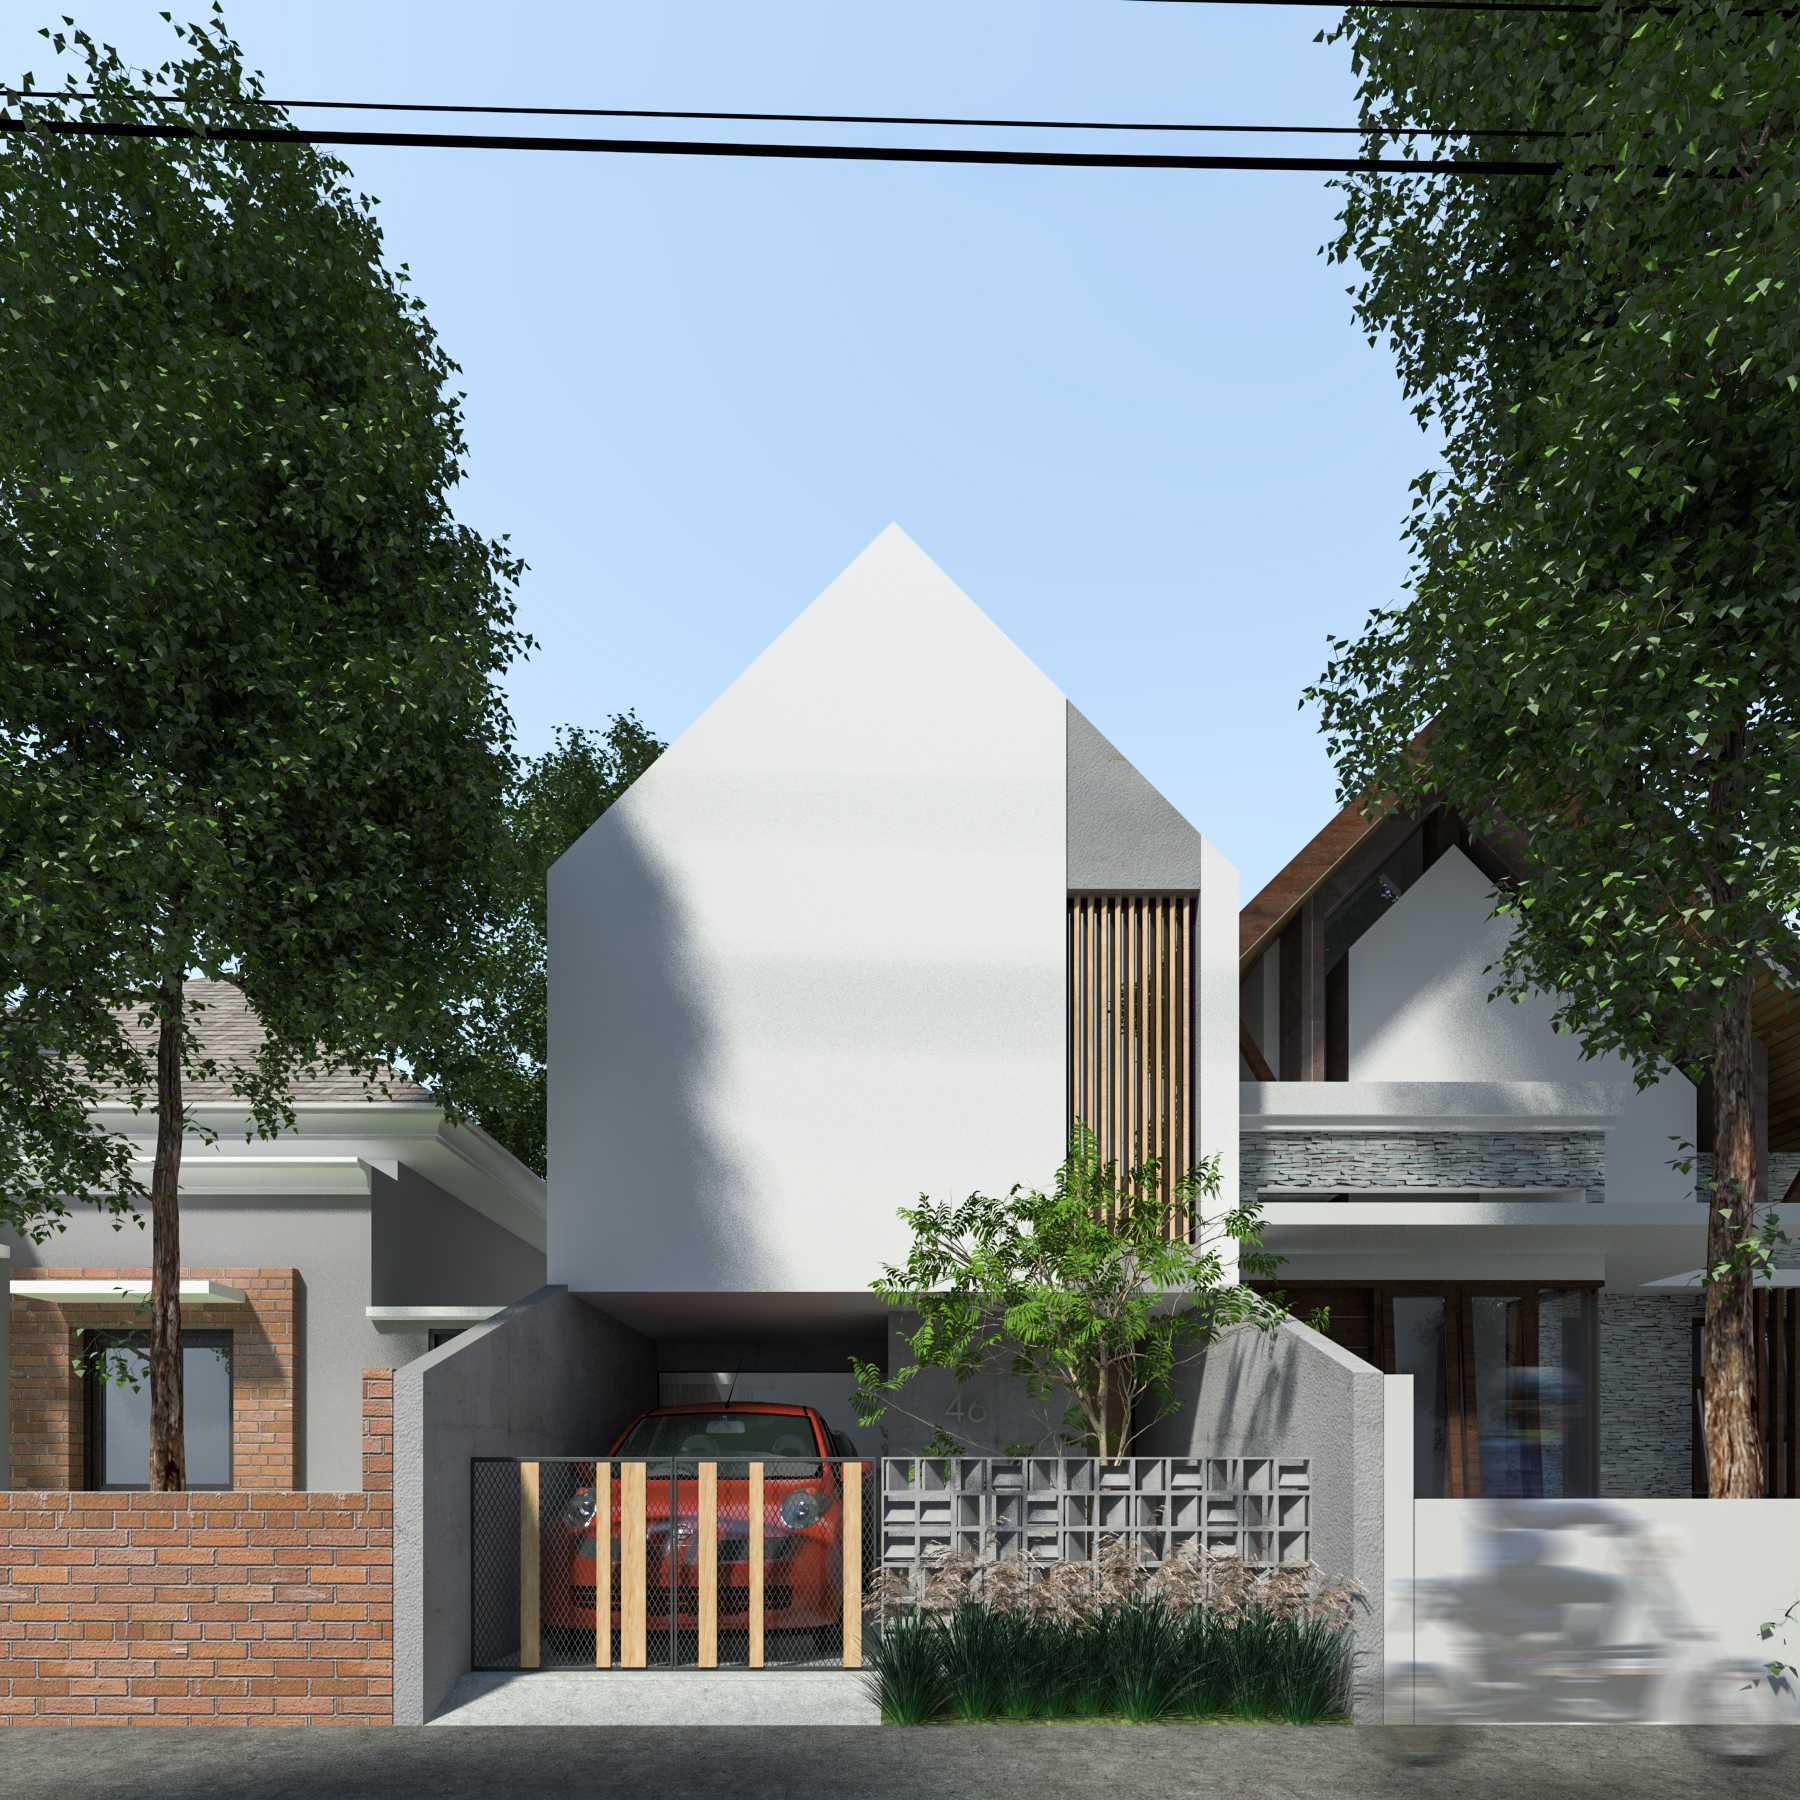 Sutastudio 5 X 8 House Daerah Khusus Ibukota Jakarta, Indonesia Daerah Khusus Ibukota Jakarta, Indonesia Sutastudio-5-X-8-House   64538